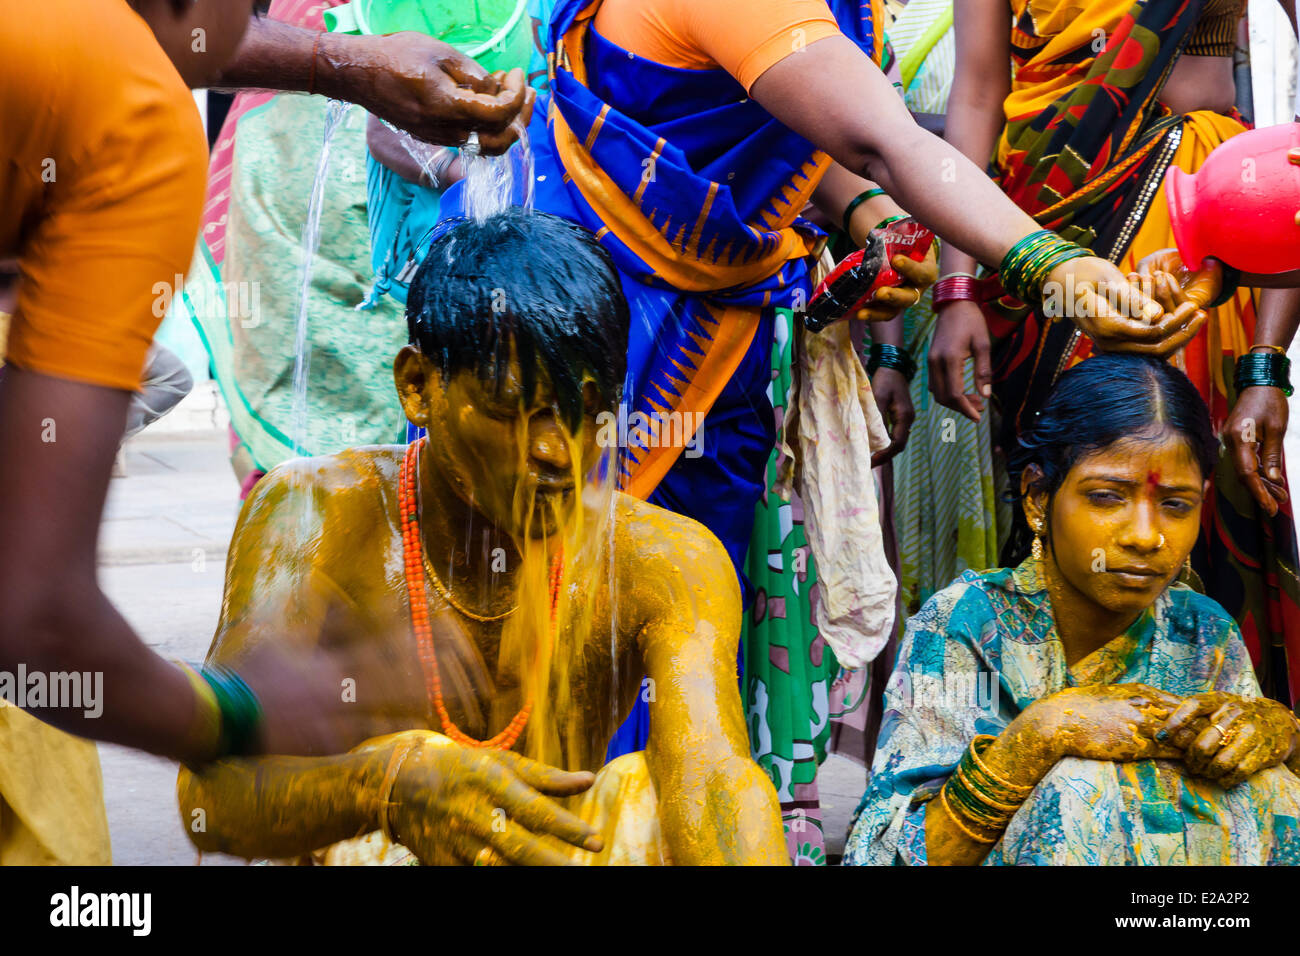 India, Karnataka state, Hampi, new wed couple during the ceremony - Stock Image